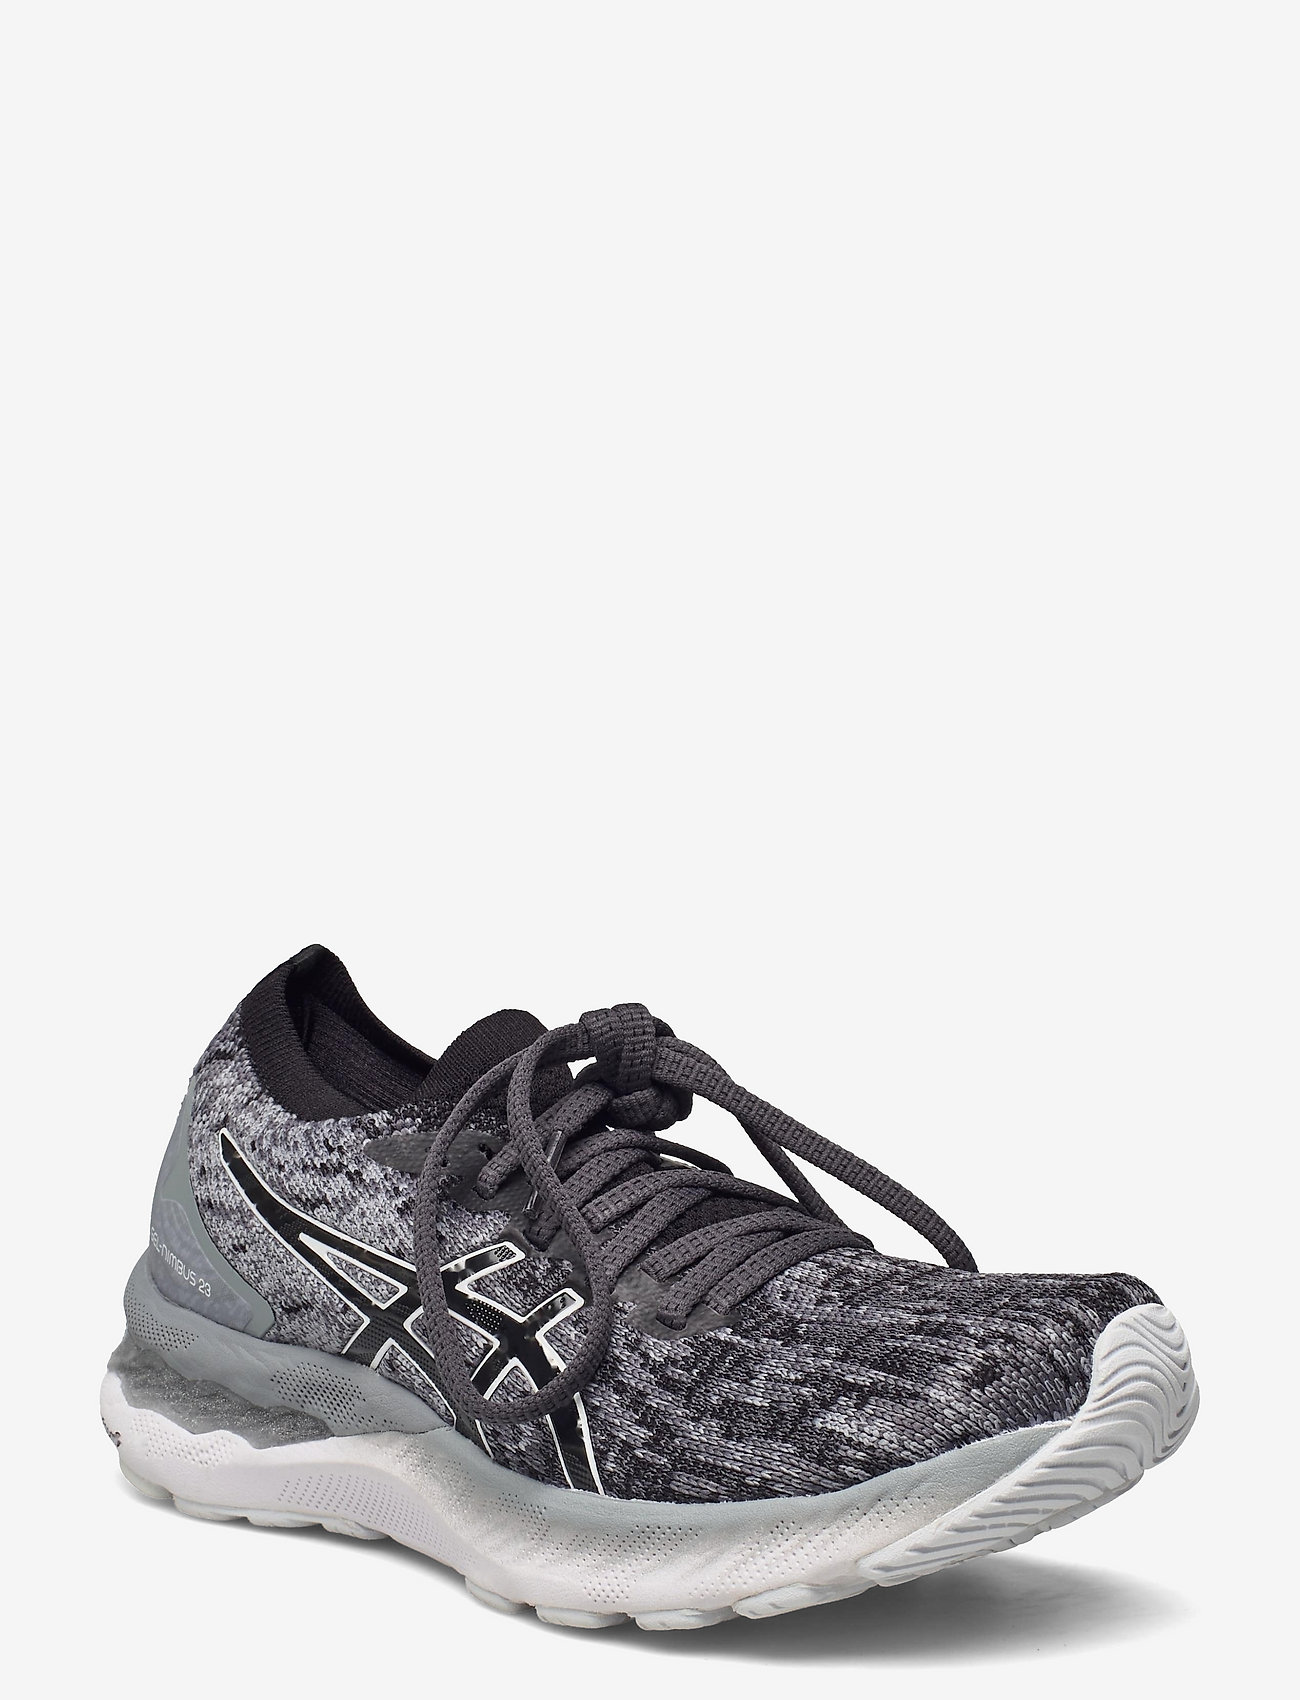 Asics - GEL-NIMBUS 23 KNIT - running shoes - sheet rock/black - 0